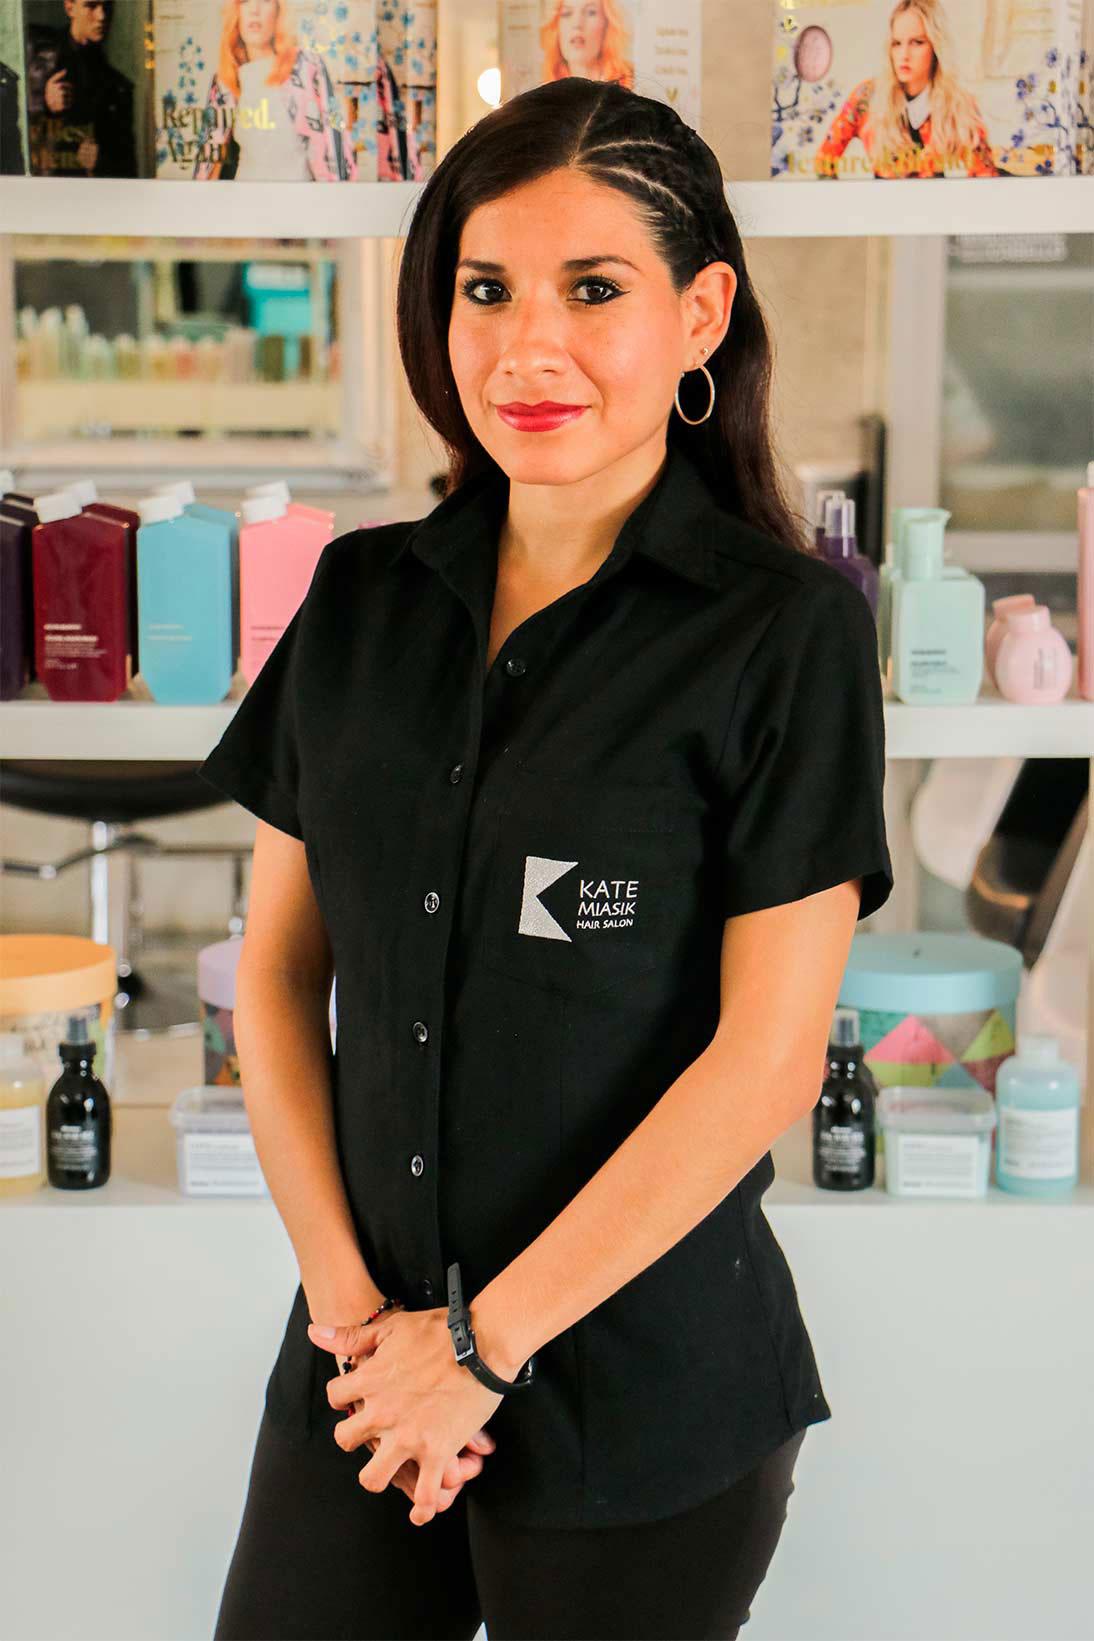 Yist - Kate Miasik Salon